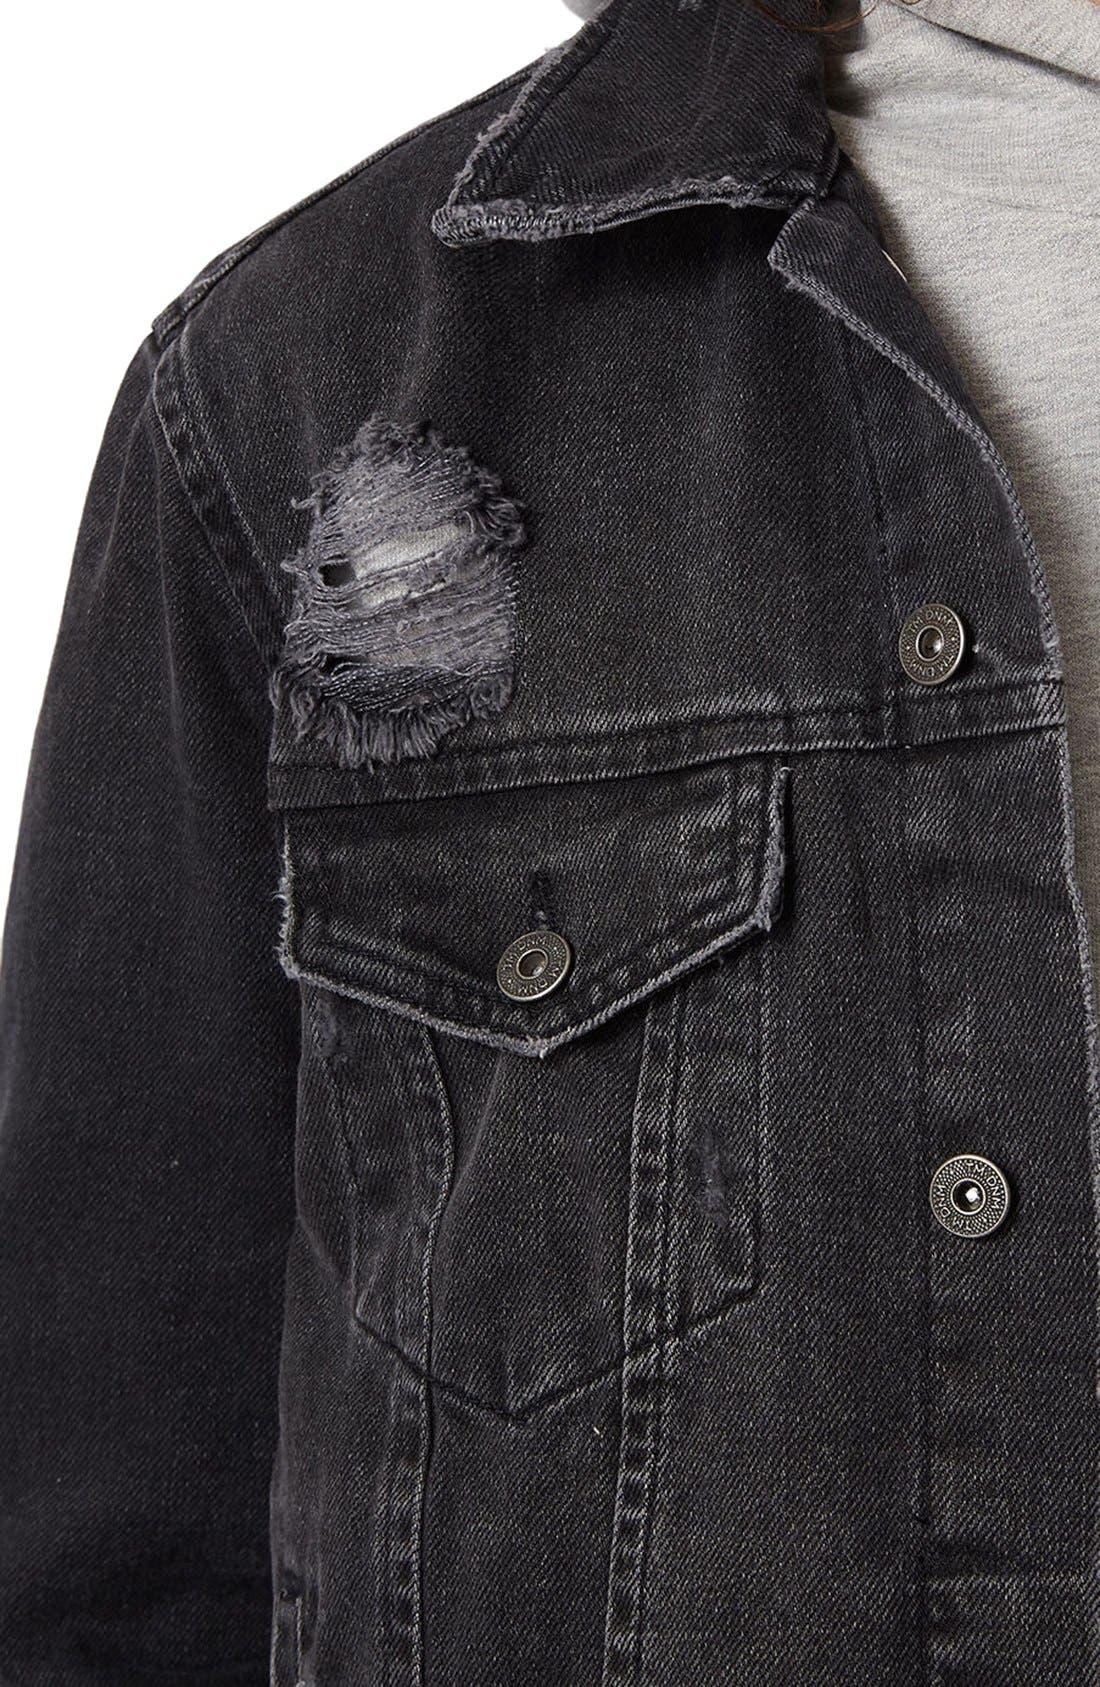 Distressed Denim Jacket,                             Alternate thumbnail 8, color,                             001